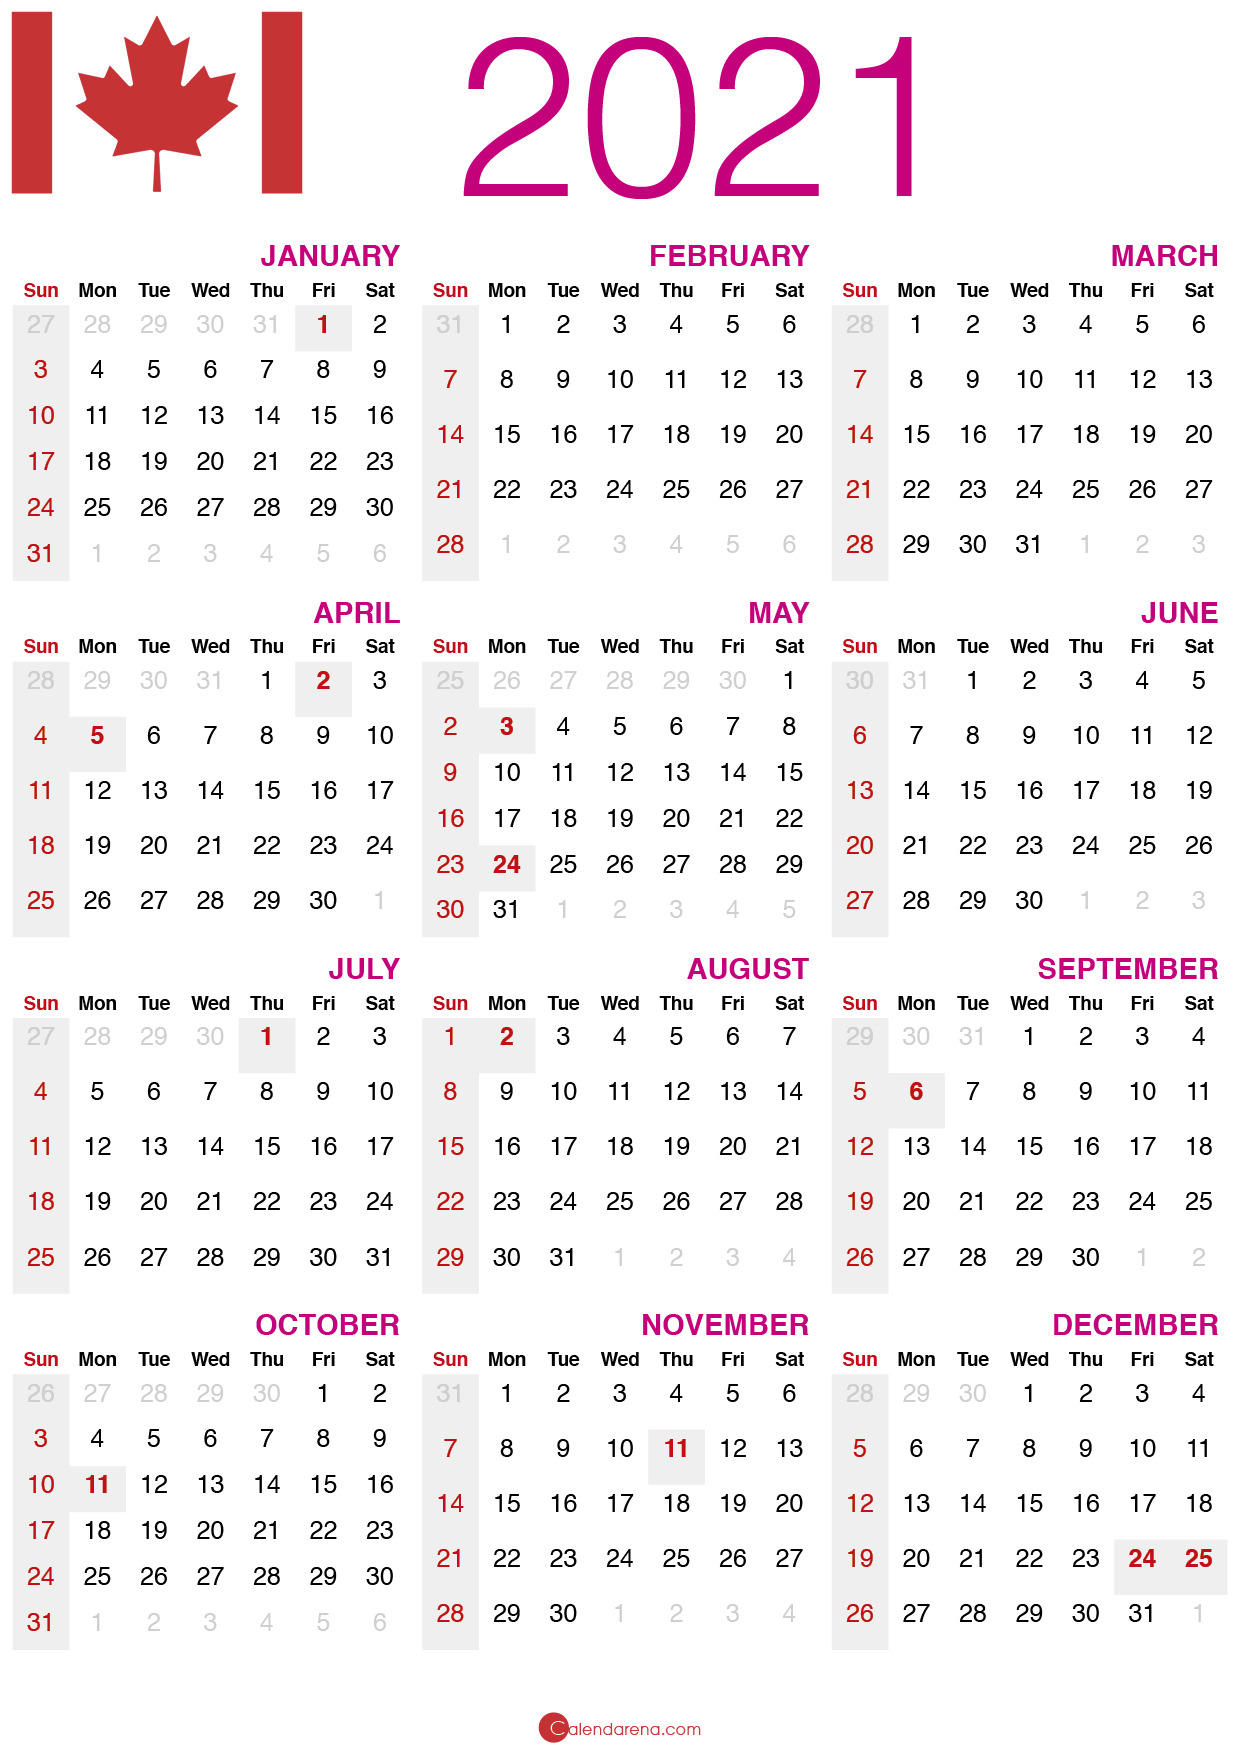 Download Free 🇨🇦 2021 Calendar Canada 🇨🇦 - Calendarena